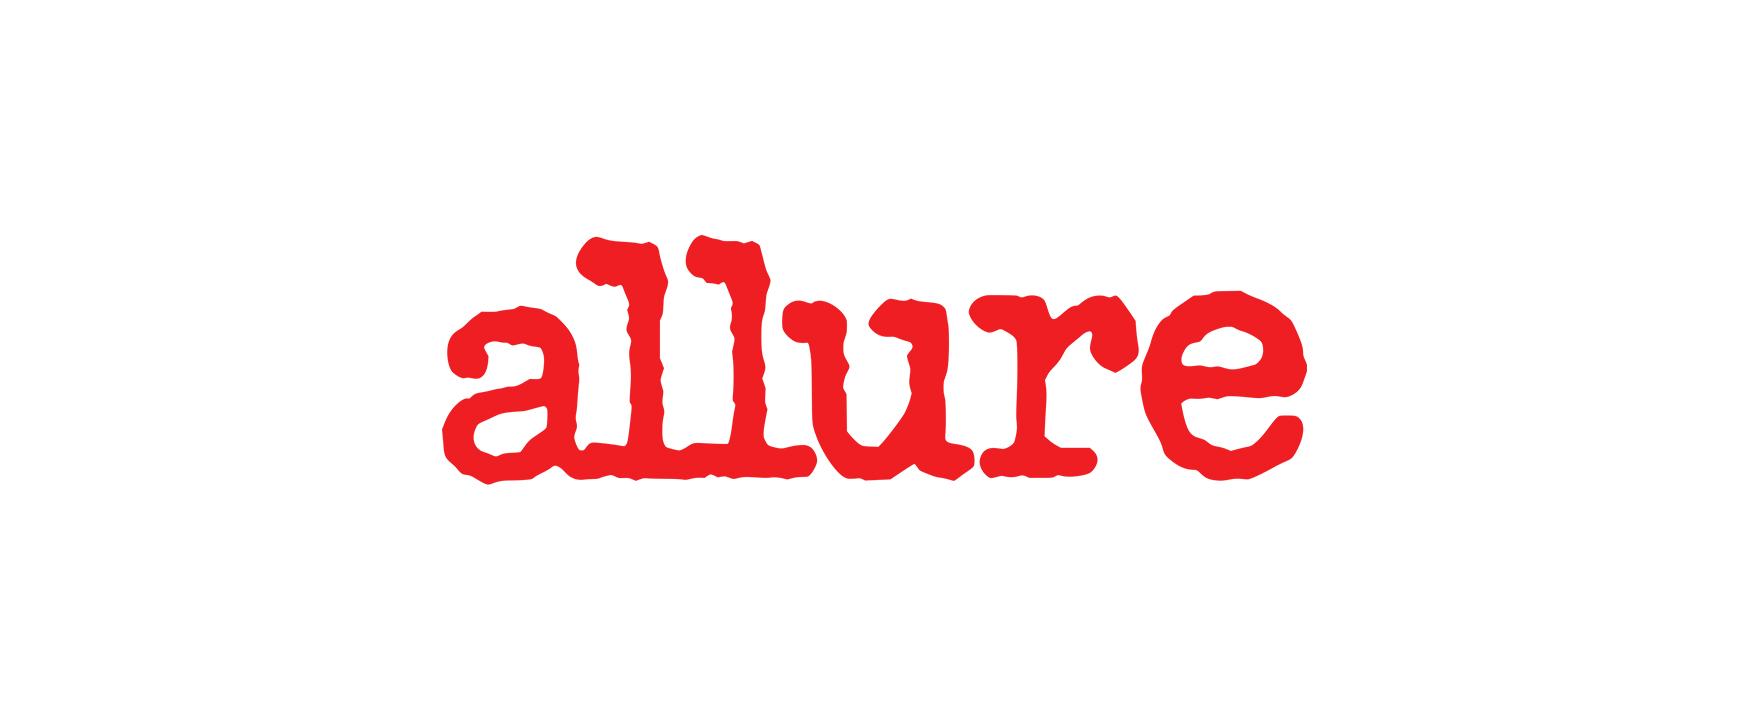 allure_logos